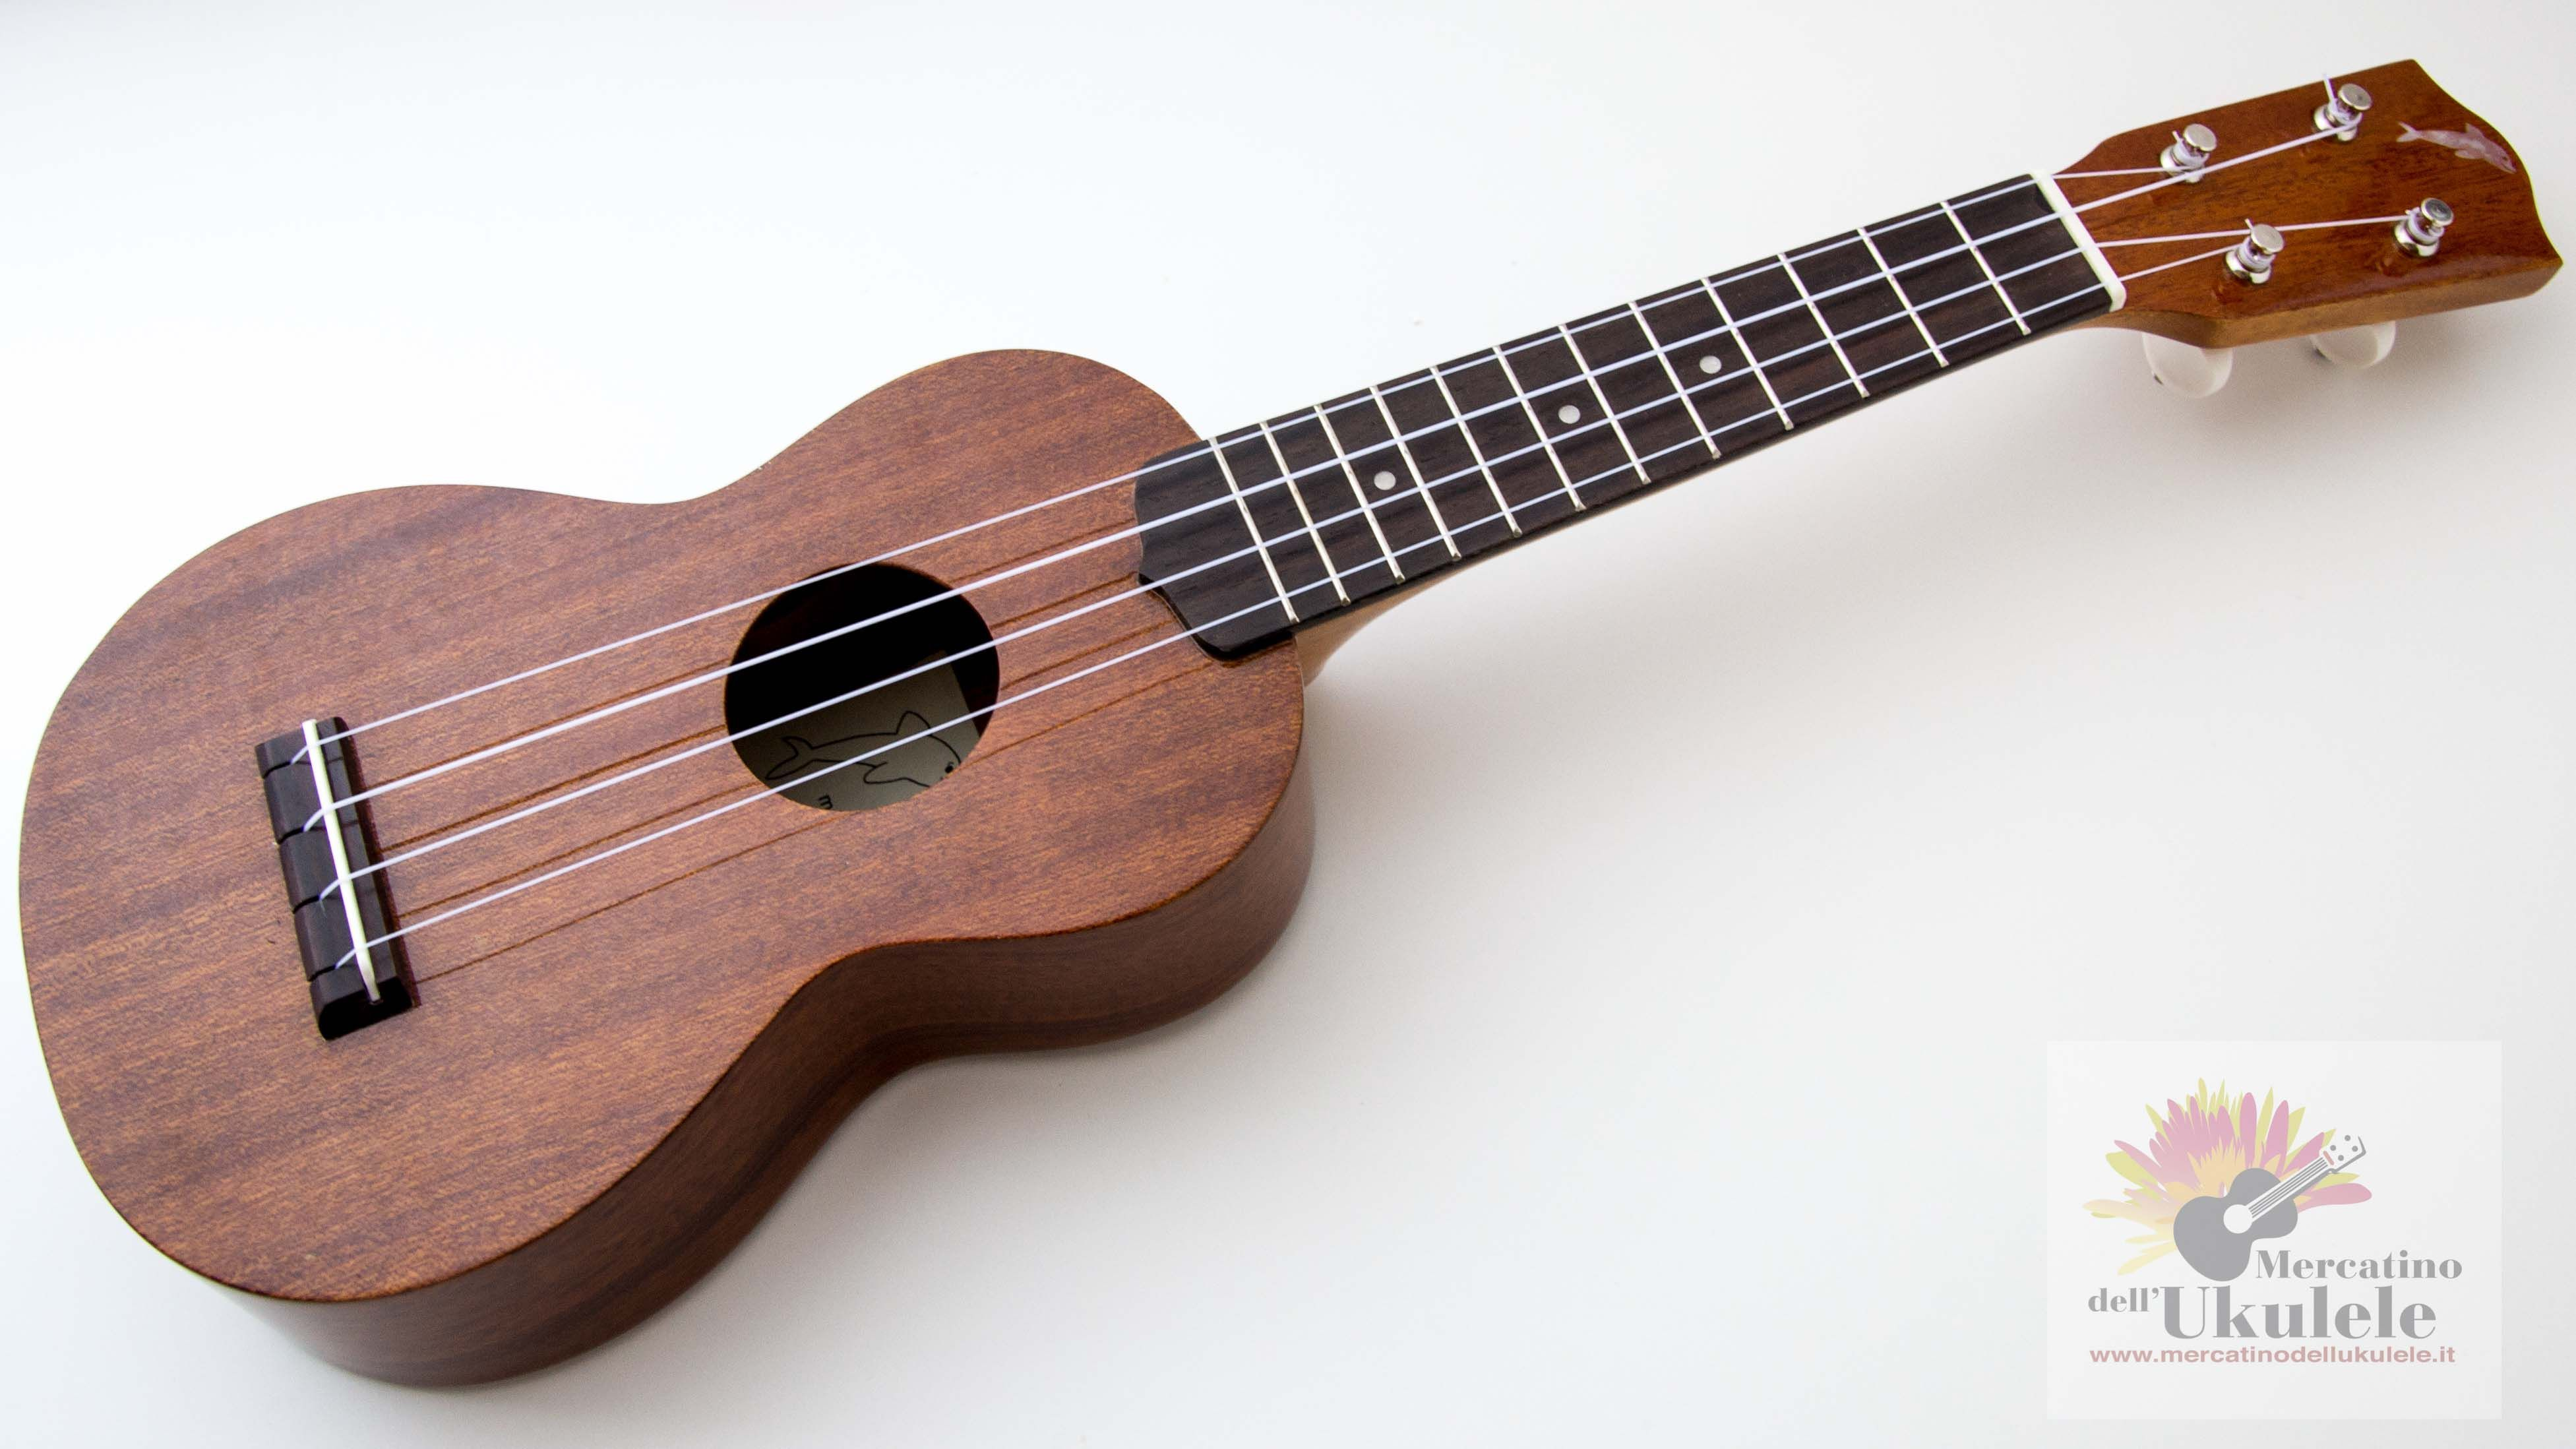 mahimahi 7g soprano - best ukulele for beginners! | tips for ukulele